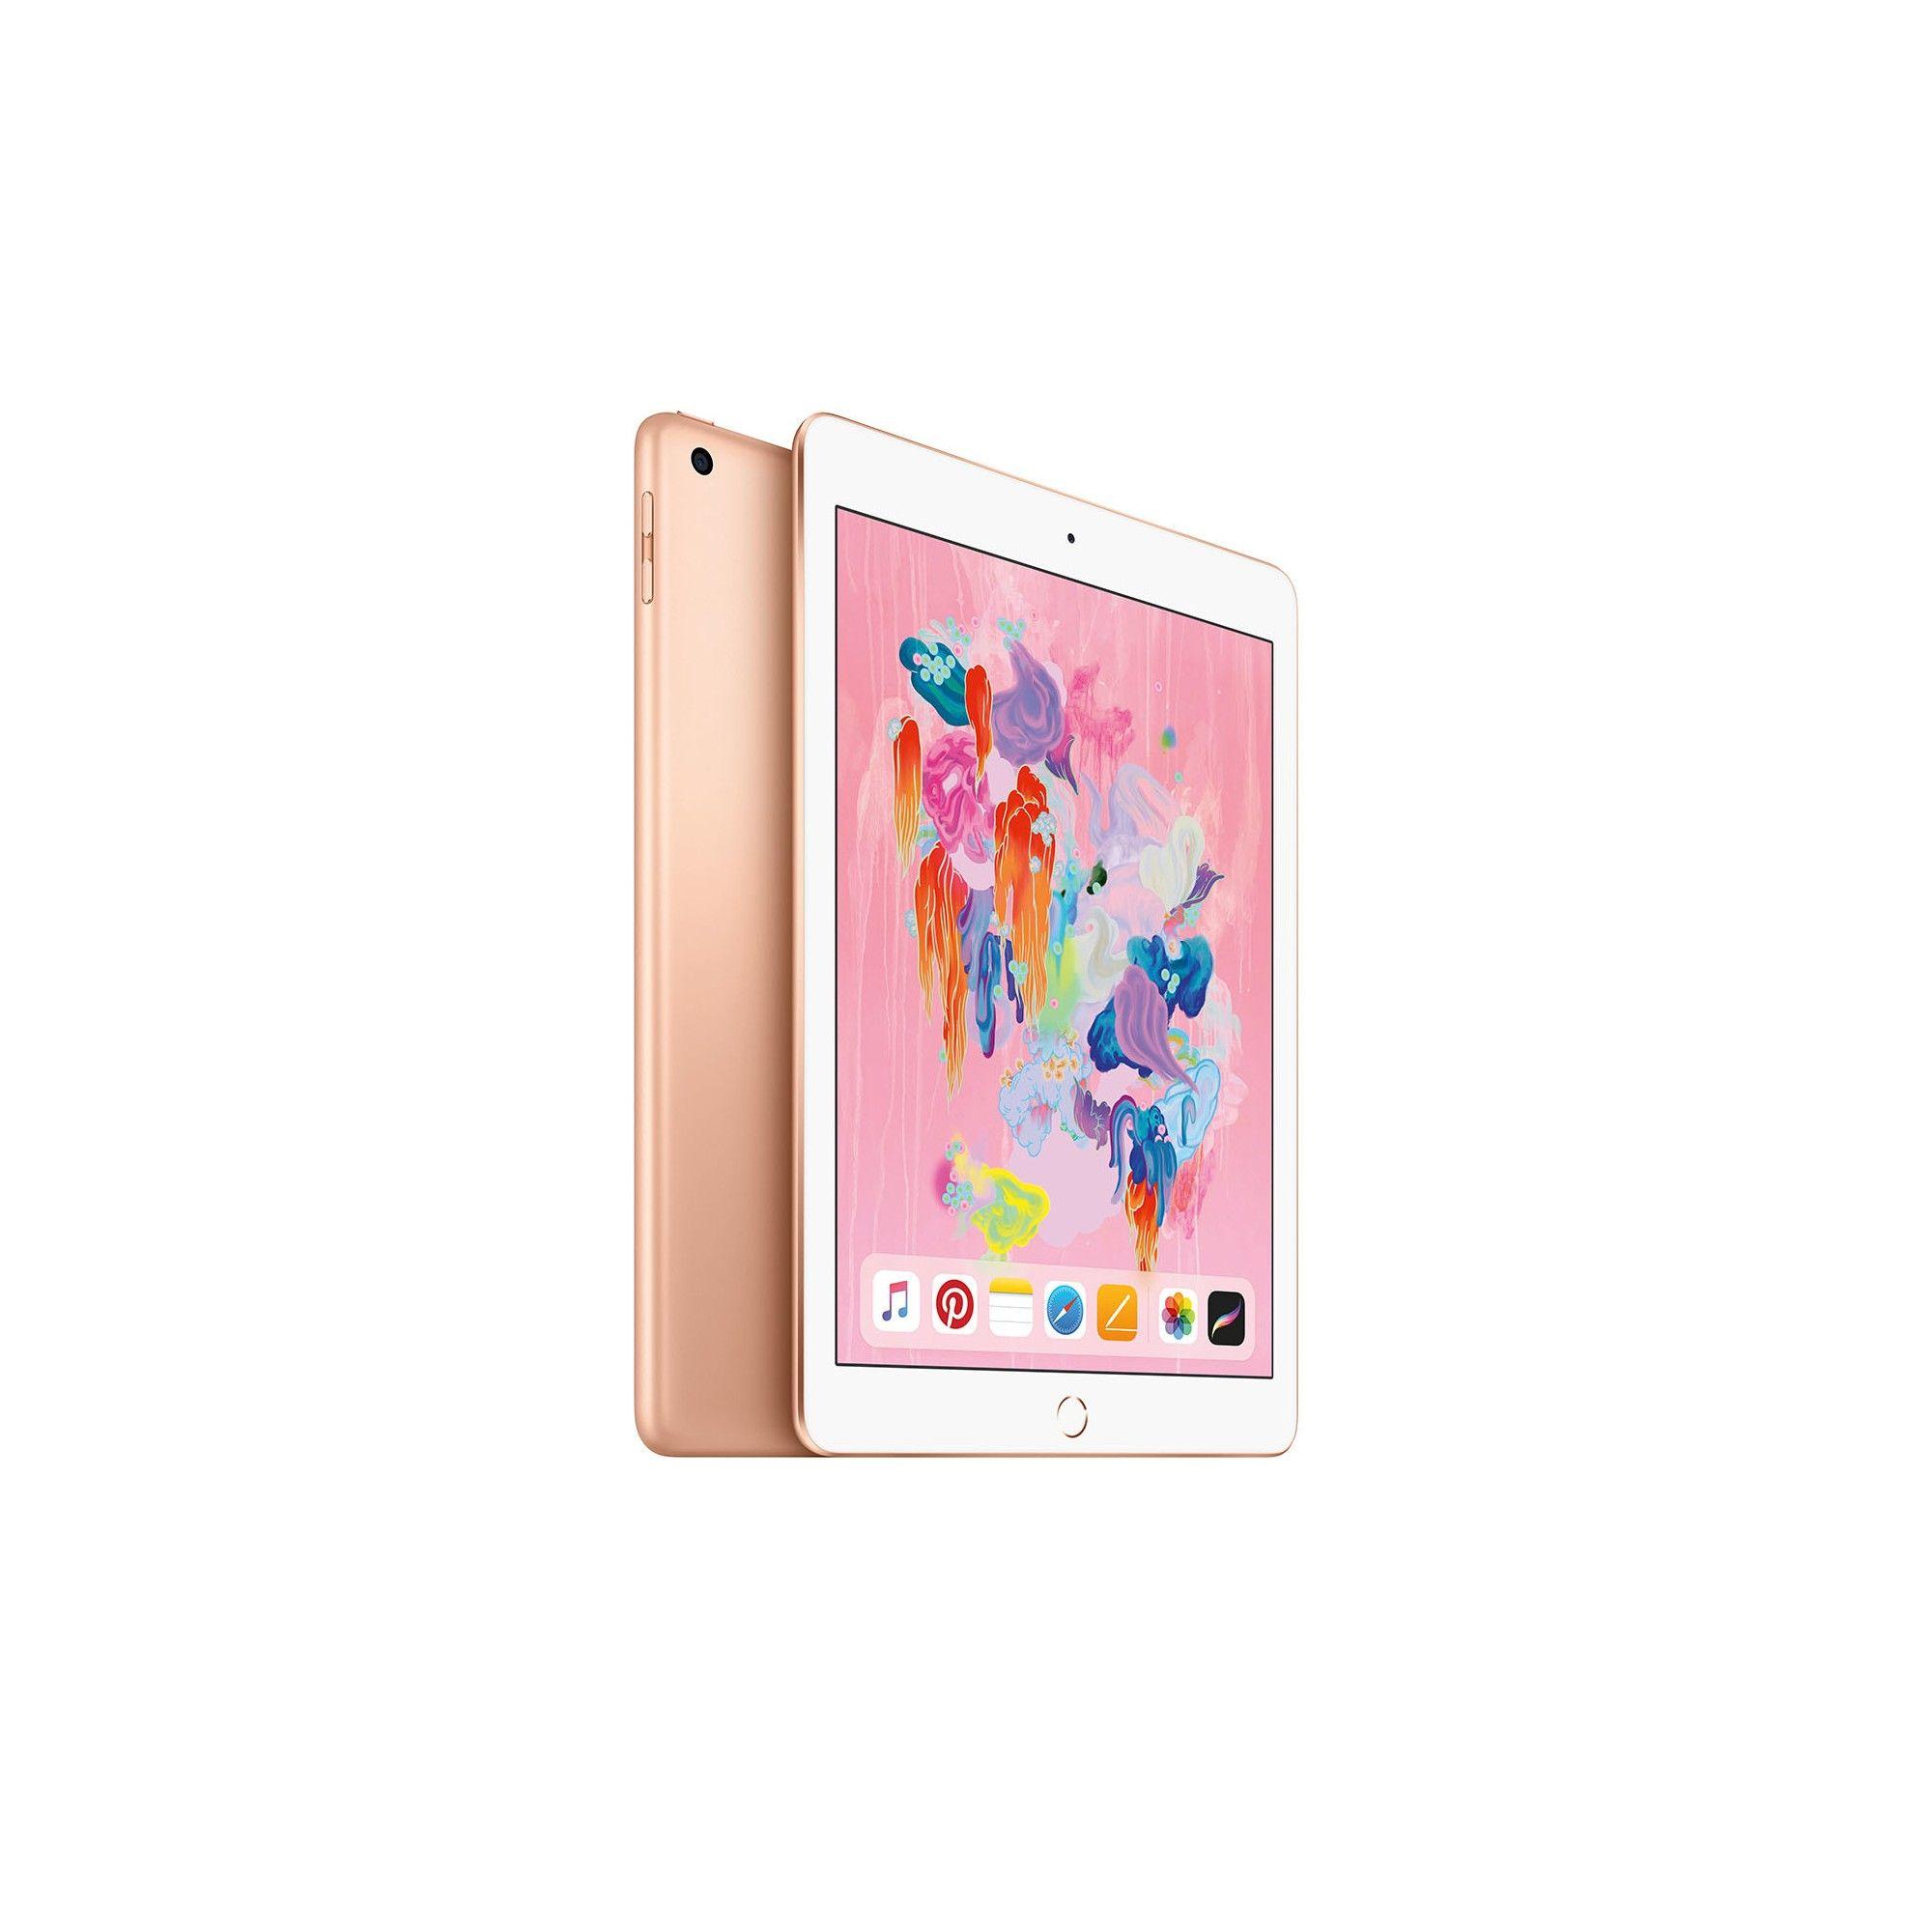 Apple iPad 9.7inch 32GB WiFi Only (2018 Model, 6th